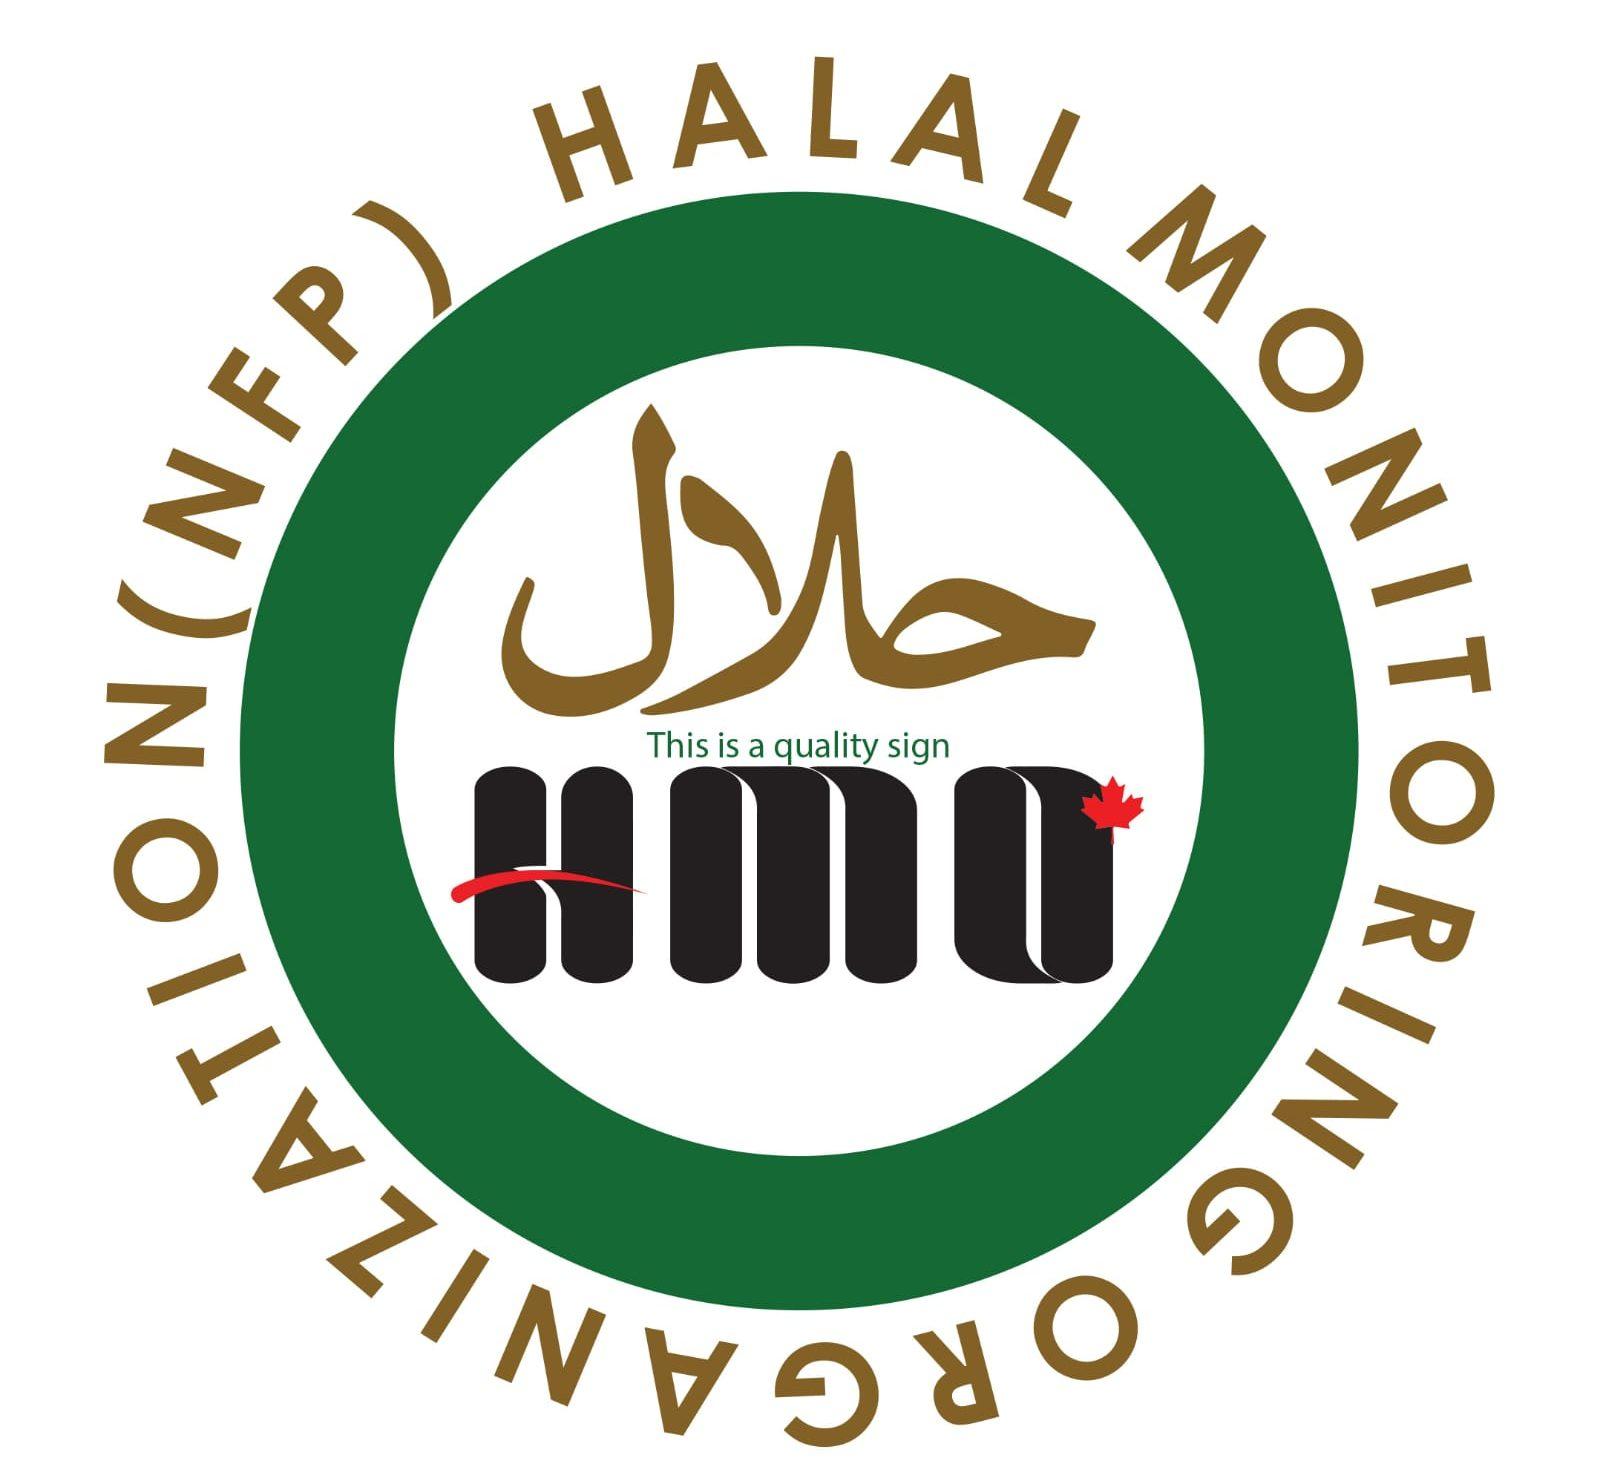 Halalmonitoring